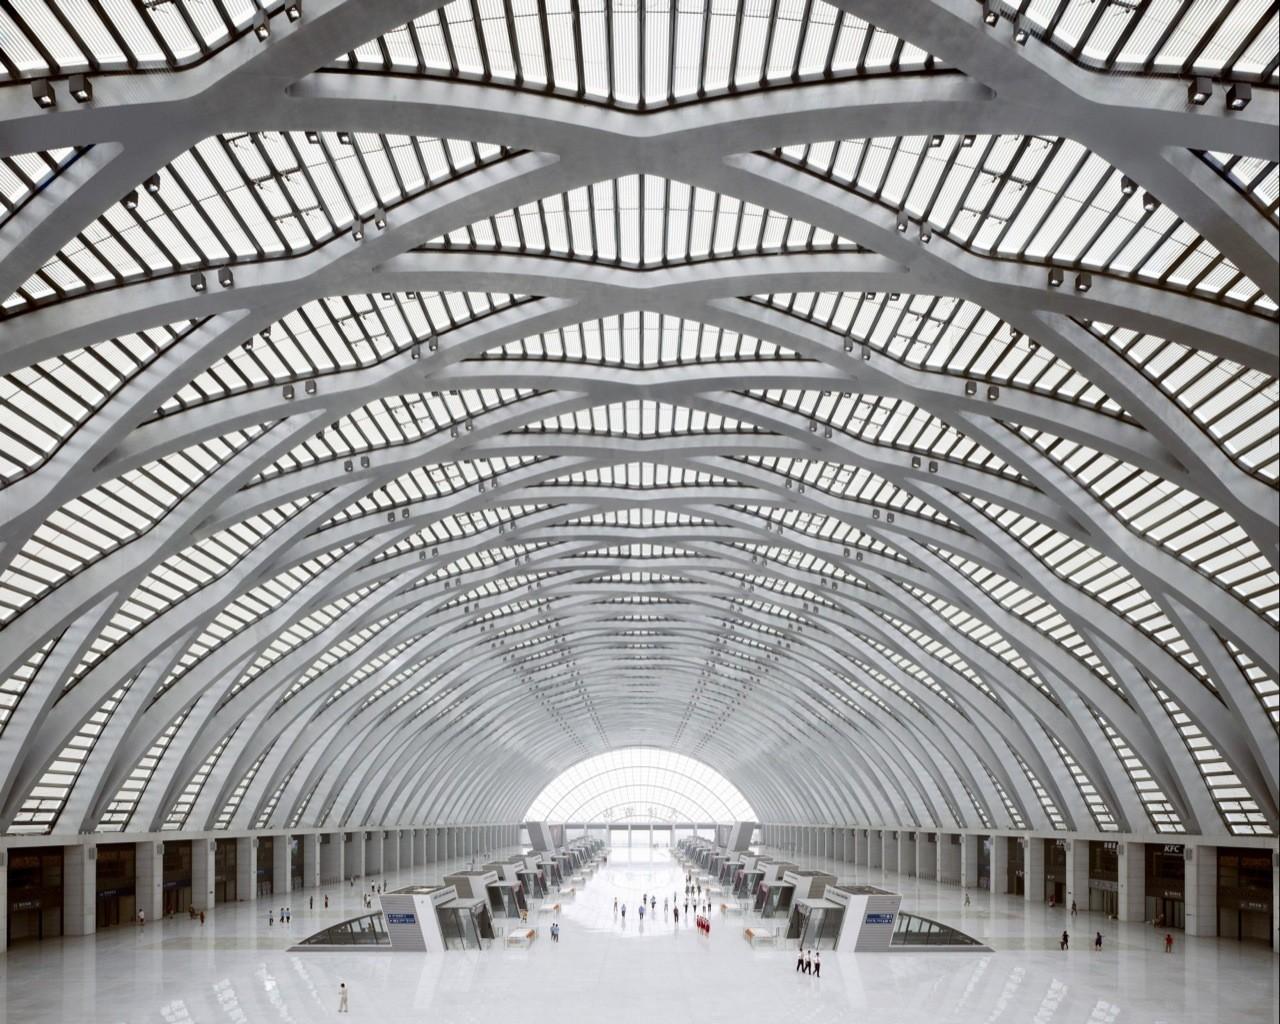 Tianjin West Railway Station / gmp architekten, Courtesy of  gmp architekten